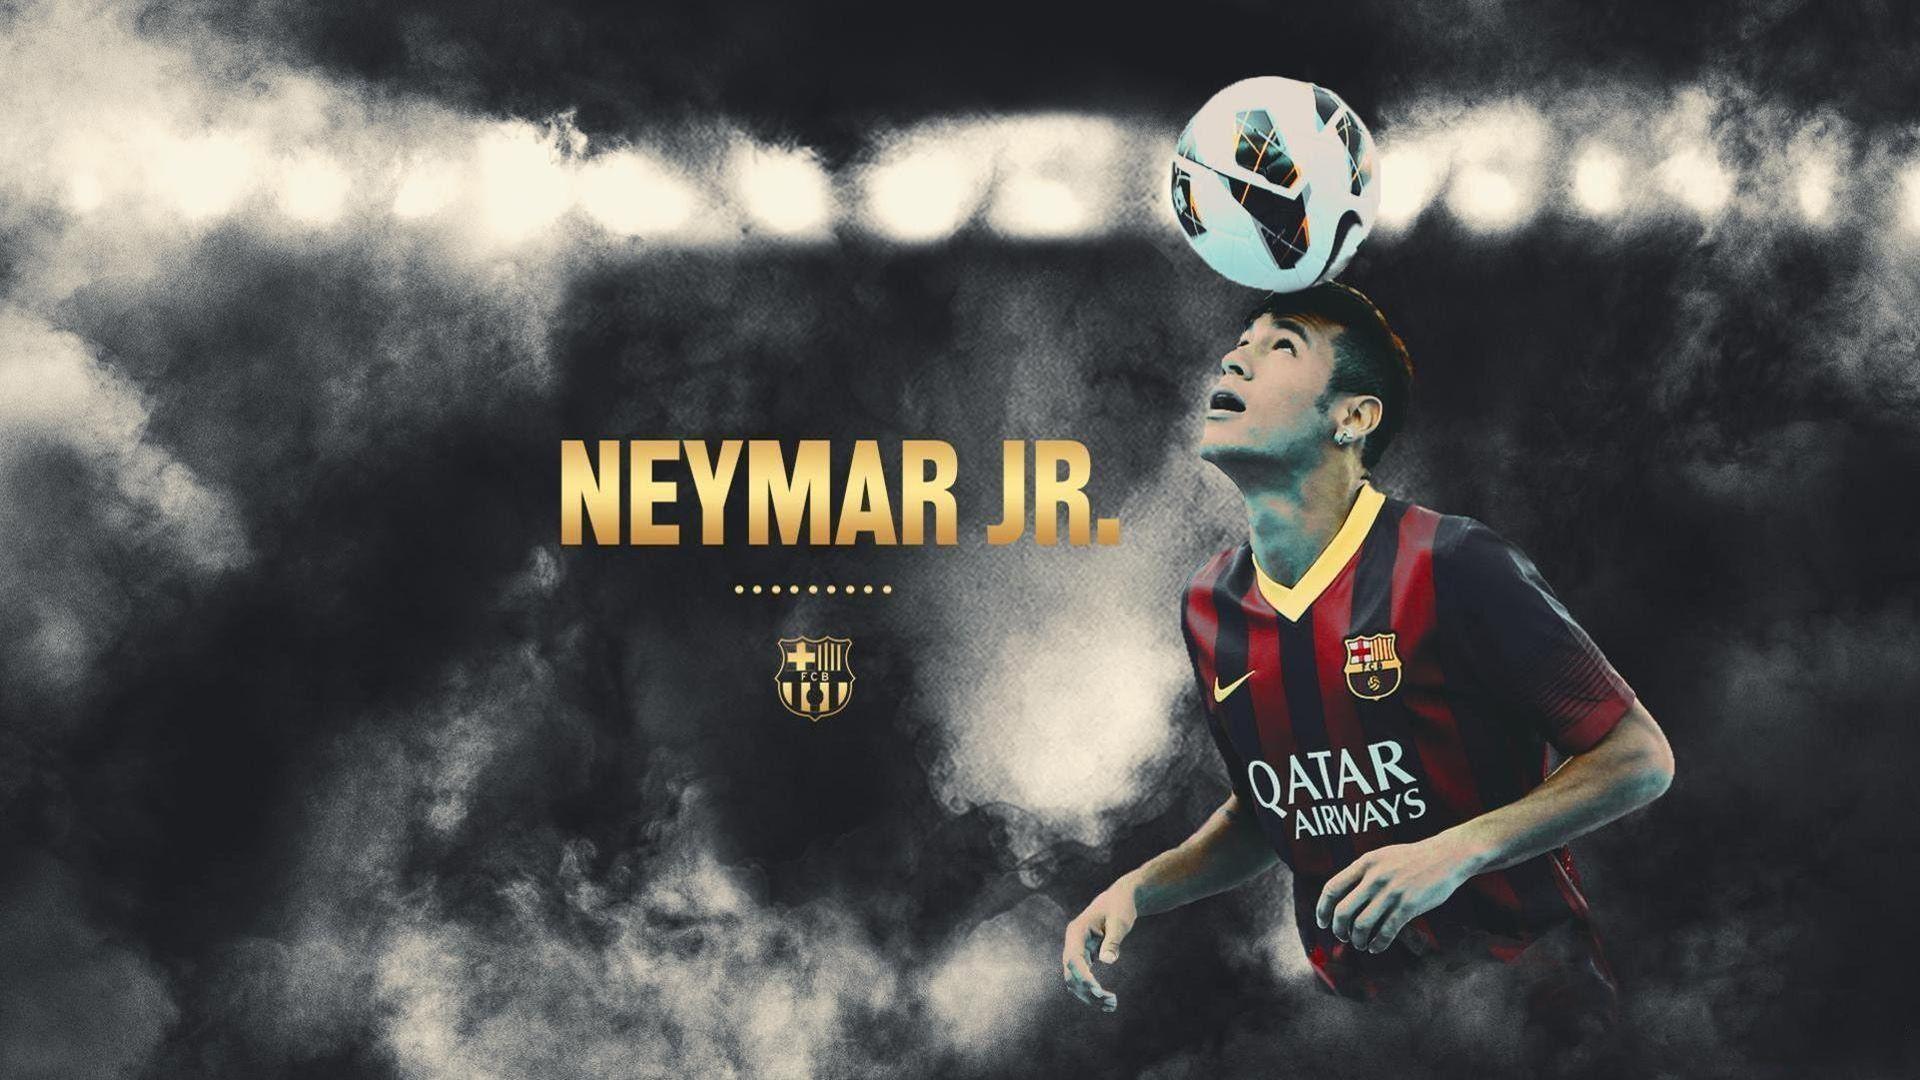 Neymar Wallpaper HD 2018 (82+ images)